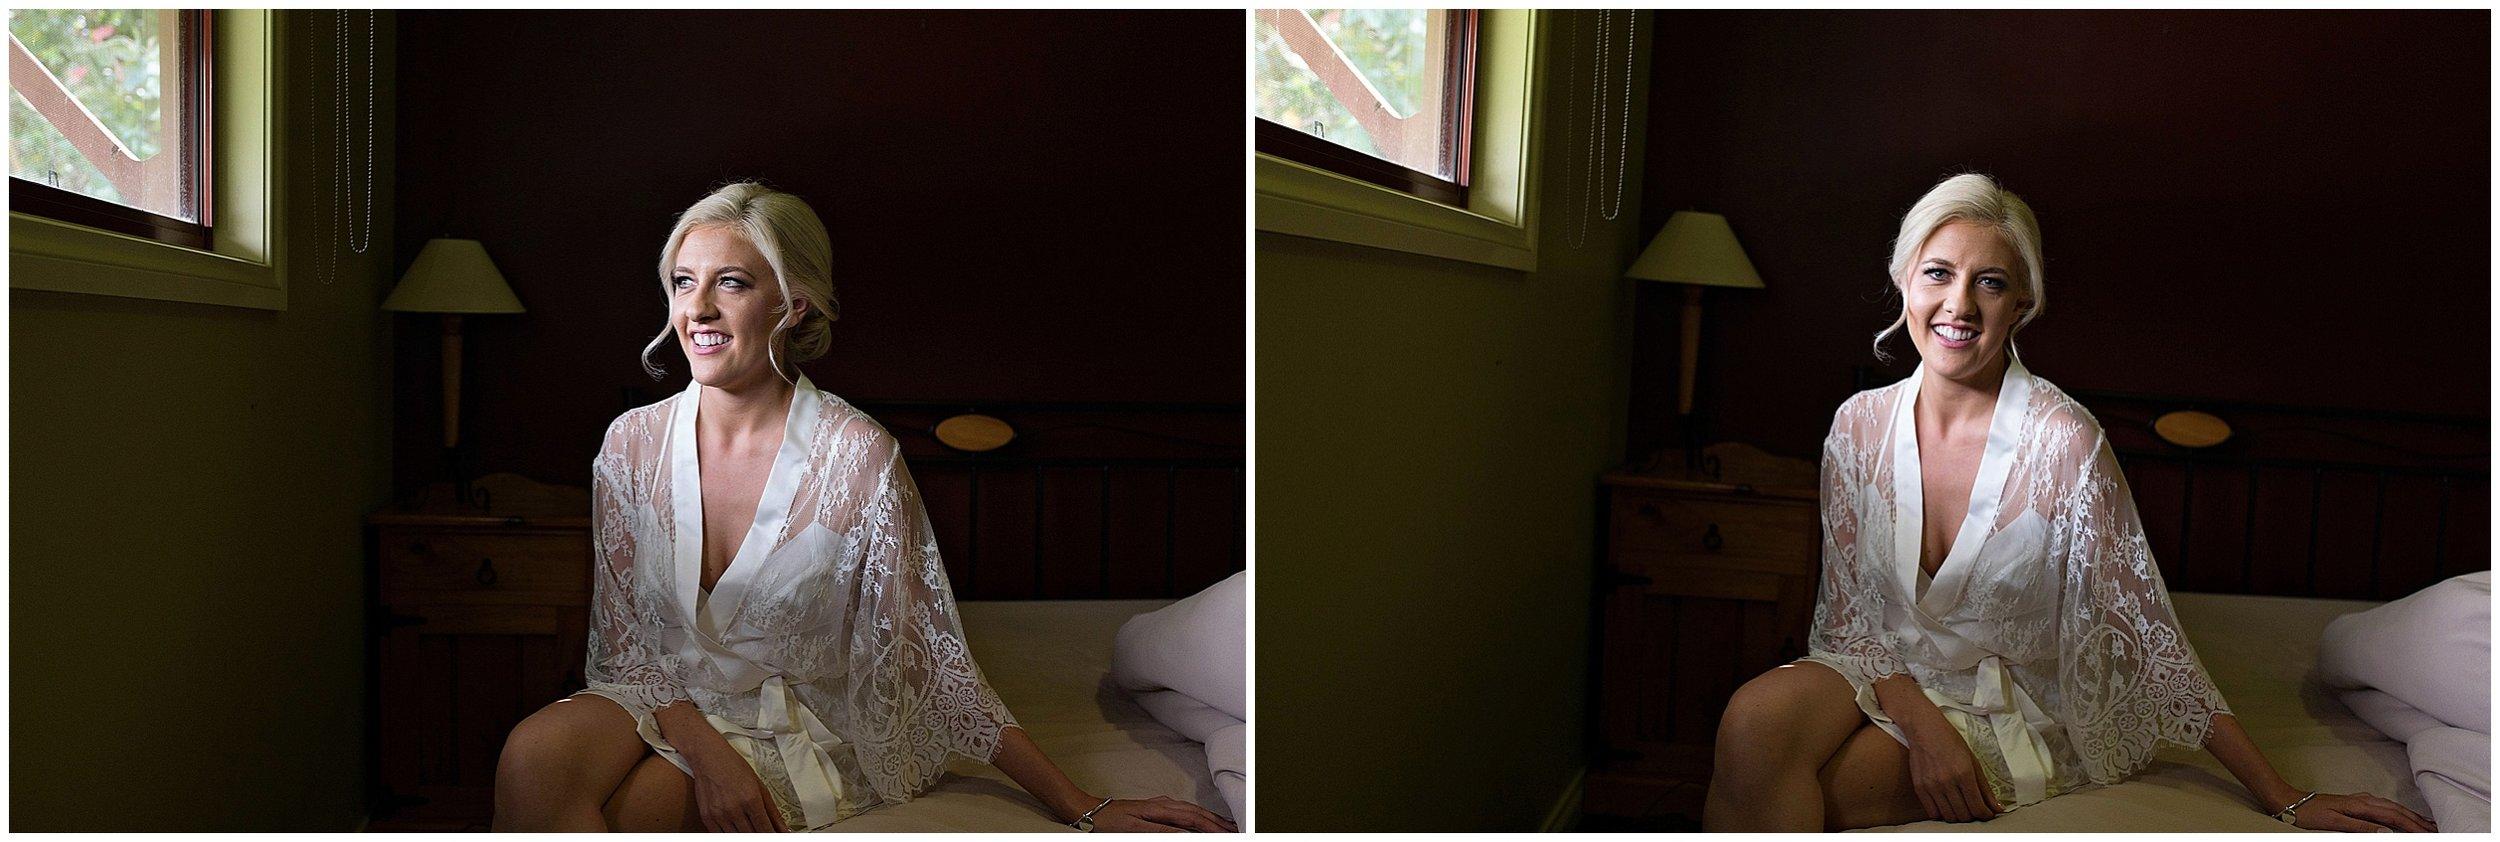 shepparton-wedding-photographer_0086.jpg